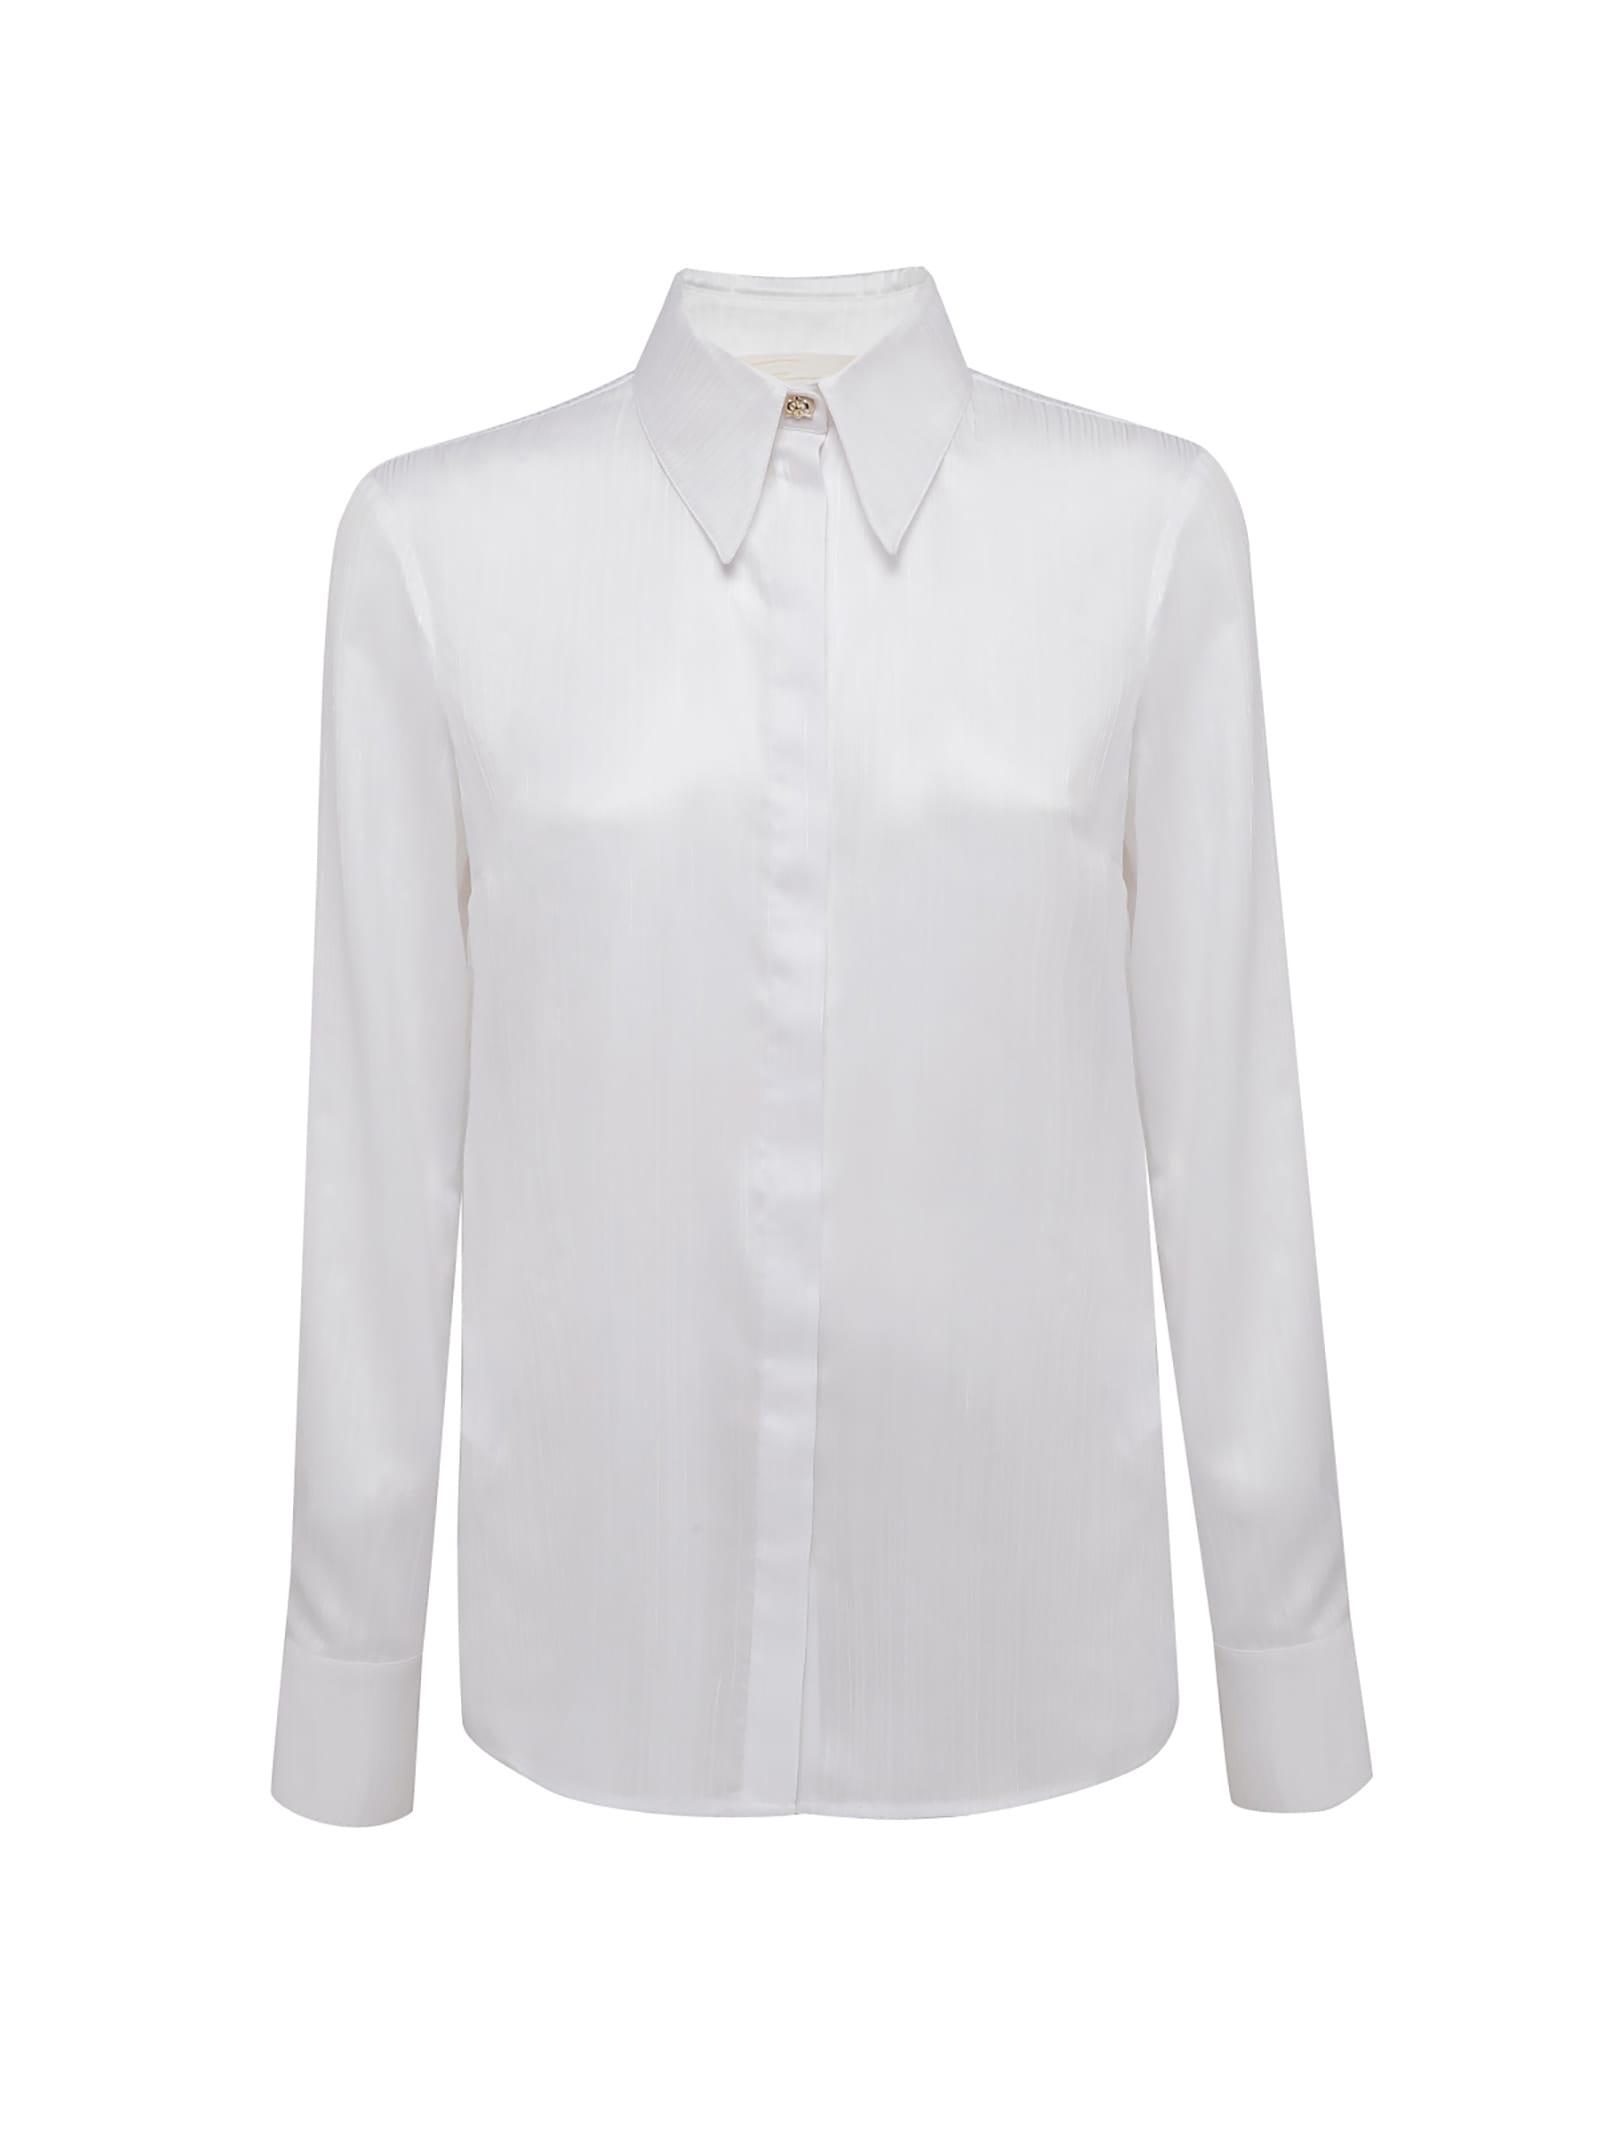 White Orchid-embellished Shirt